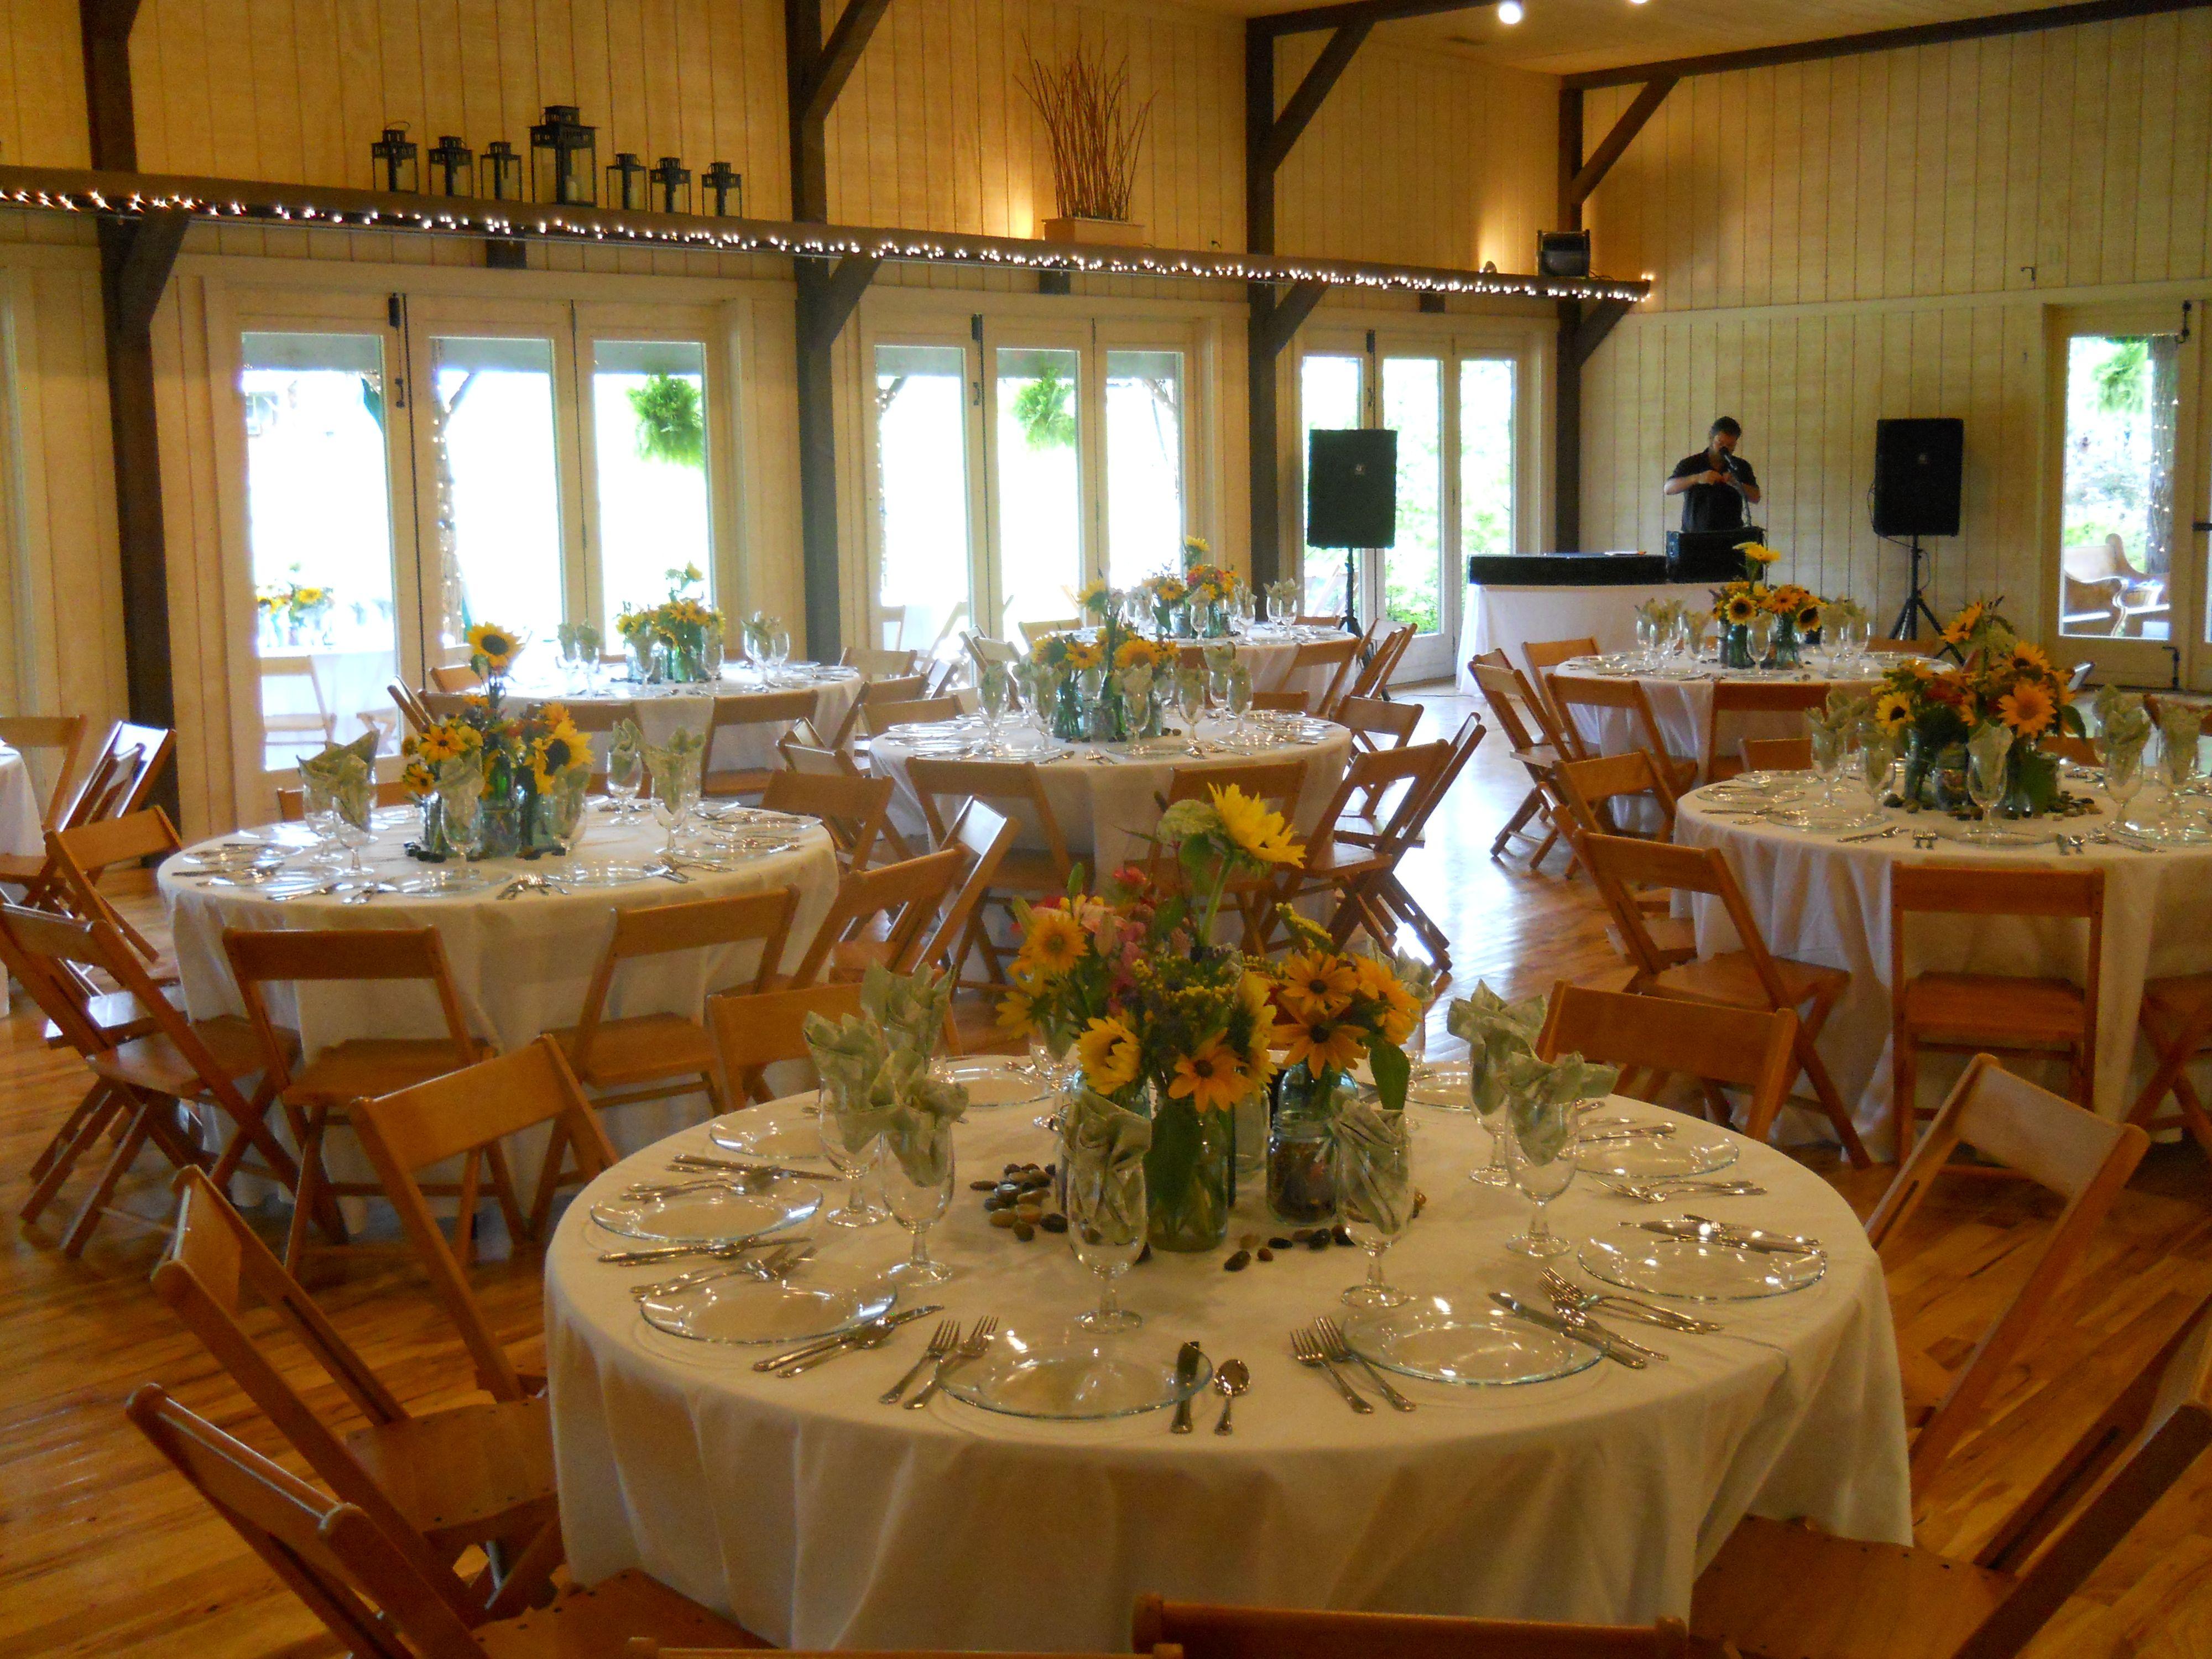 Wine Wedding Centerpieces Using Mason Jars And Bottles